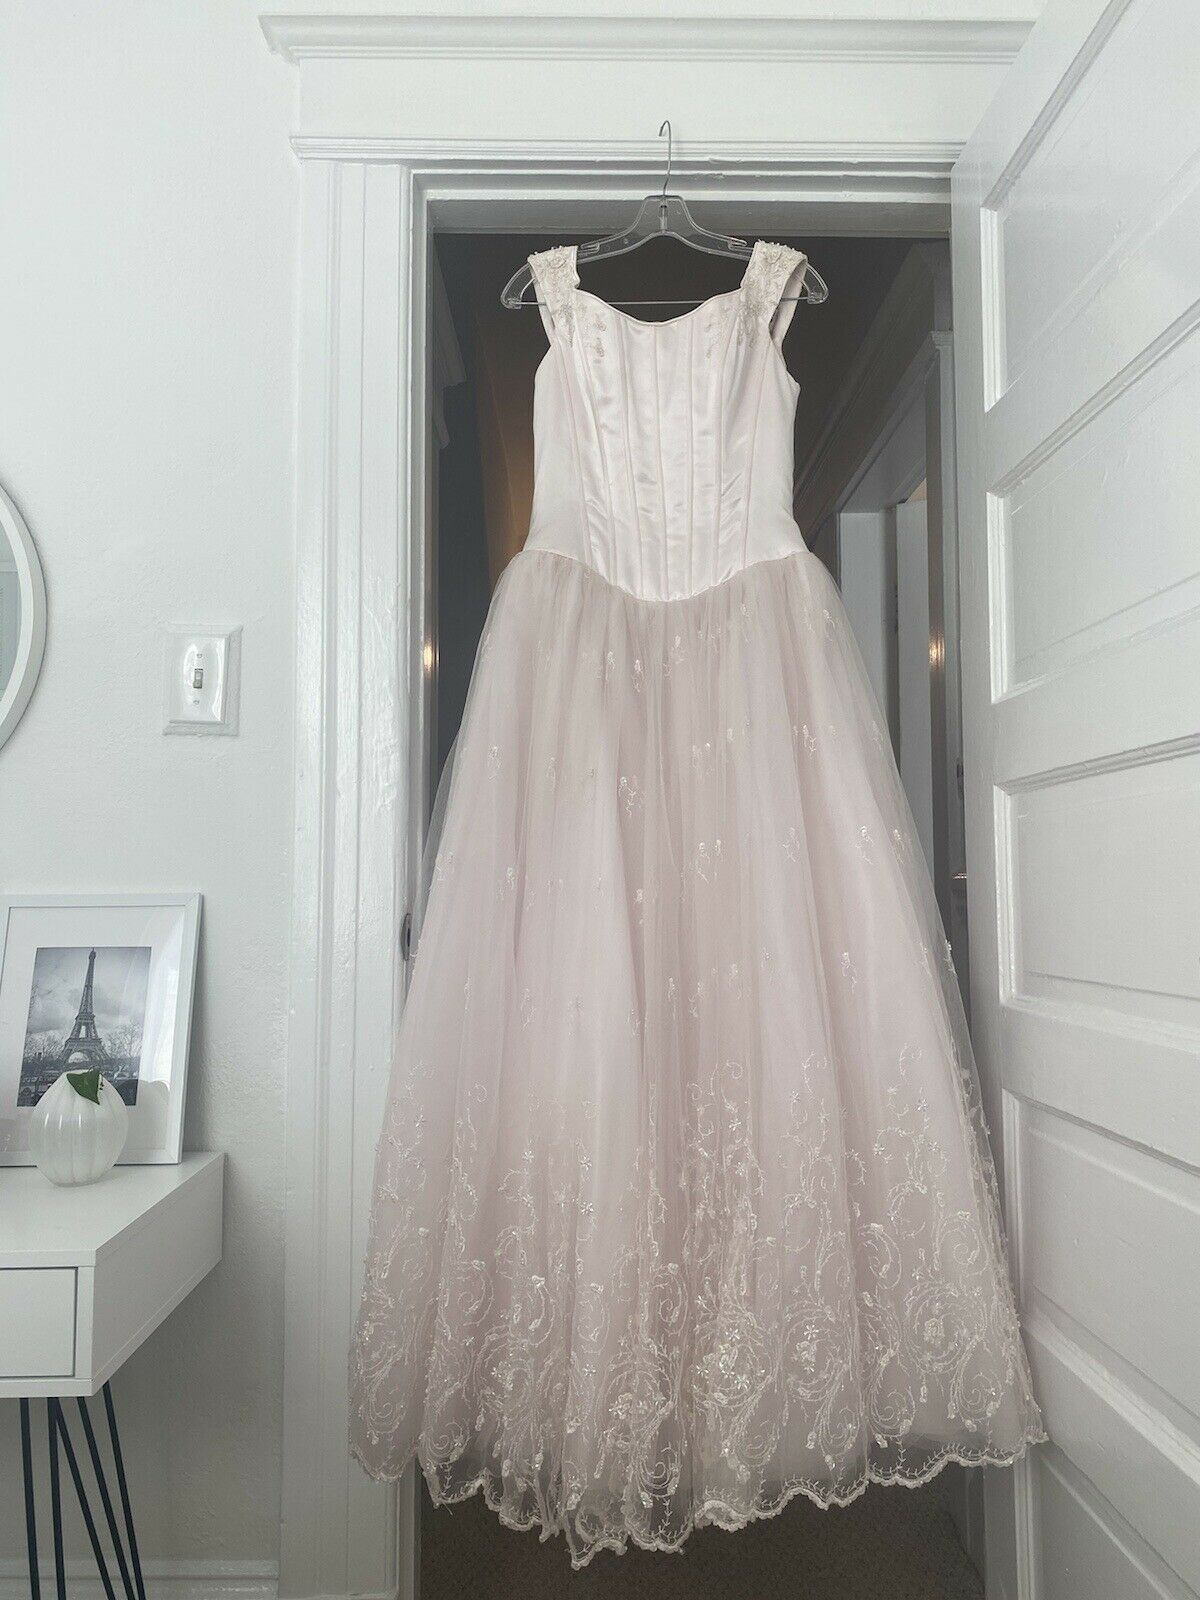 Vintage Lace A-LINE Floor Wedding Dress Heart V Neck Sleeveless Bridal Gown